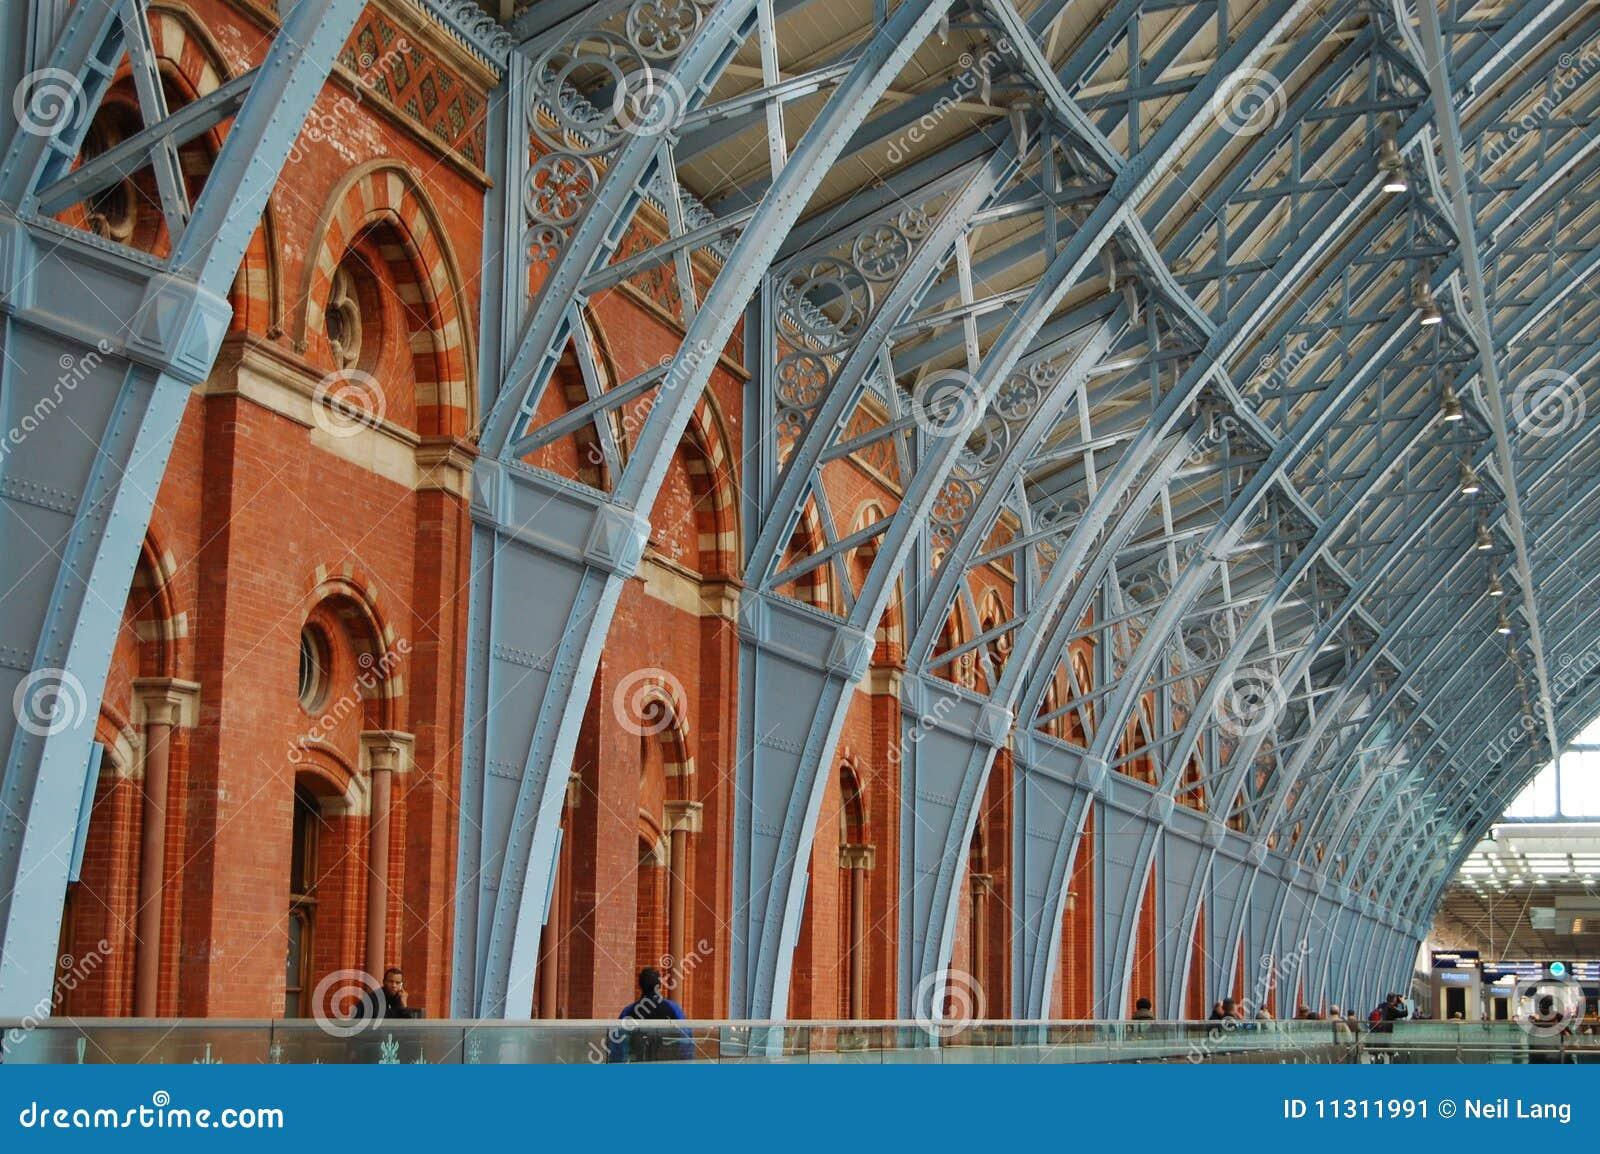 Str.Pancras International-Station